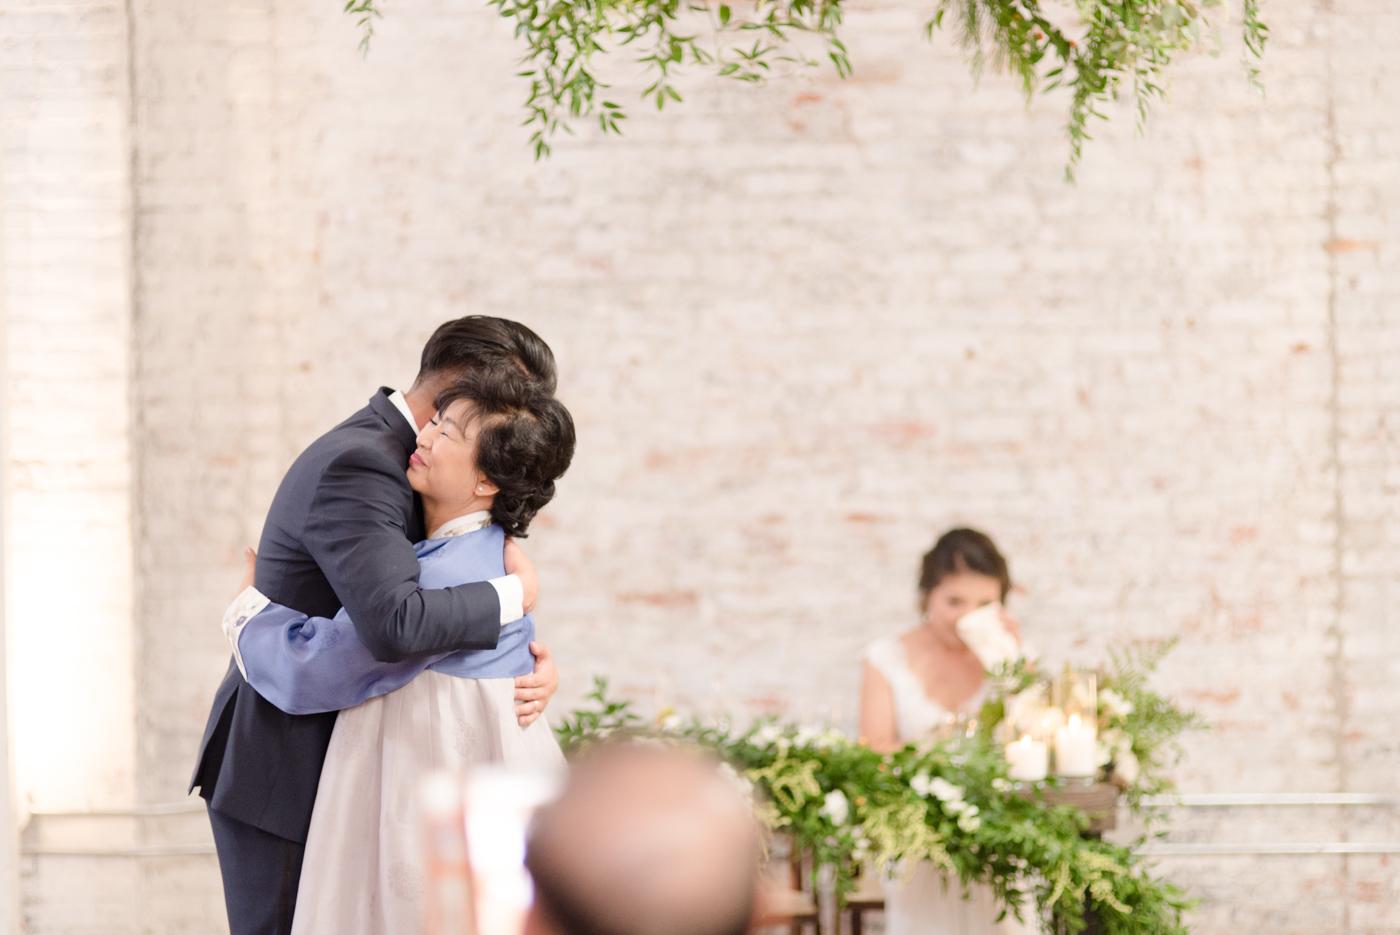 Modern_Wedding_HNYPT_Honeypot_LA_Photographer_Los_Angeles-56.jpg